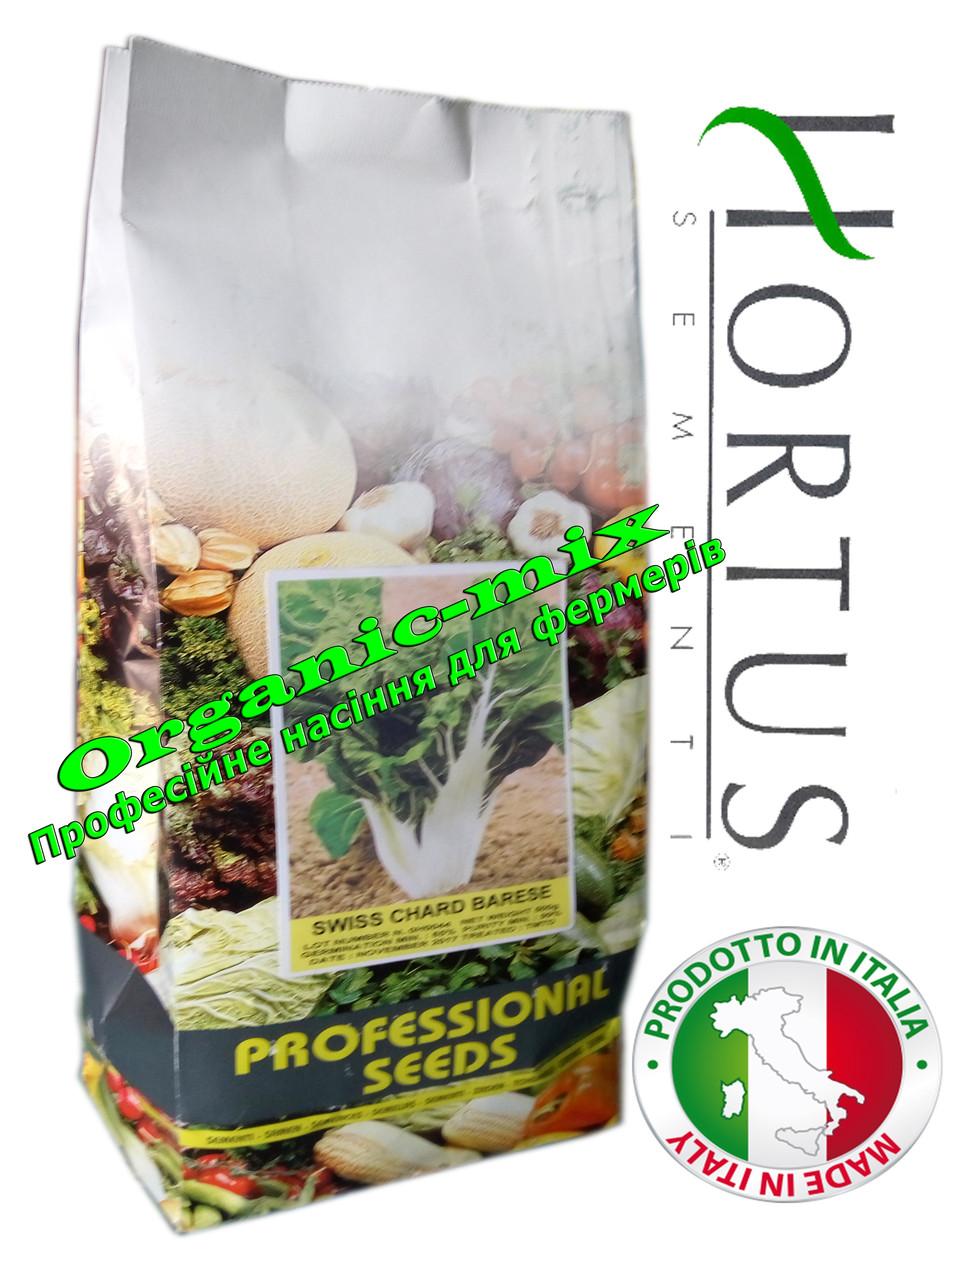 МАНГОЛЬД БЕЛЫЙ / SWISS CHARD BARESE  (упаковка проф. пакет 500 грамм) ТМ Hortus Италия